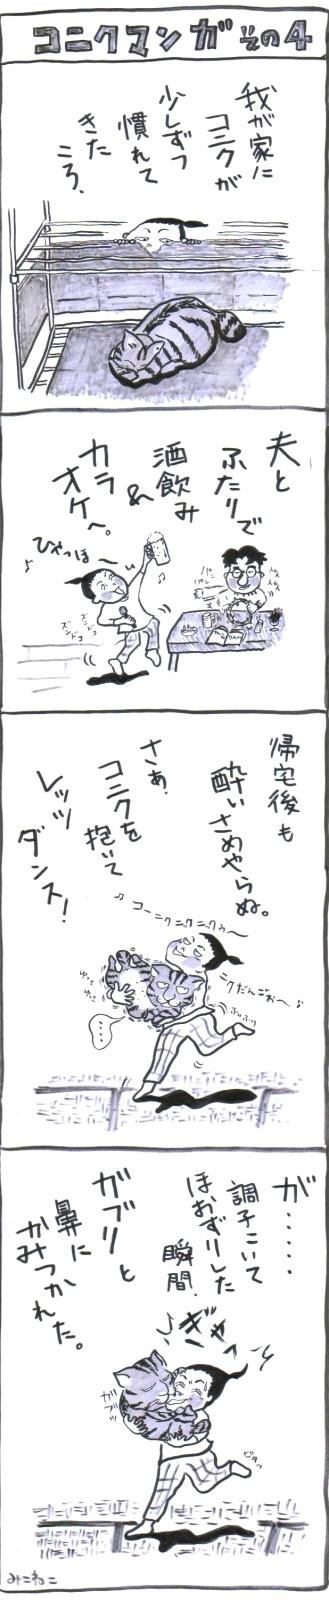 konikucomic4-1.JPG